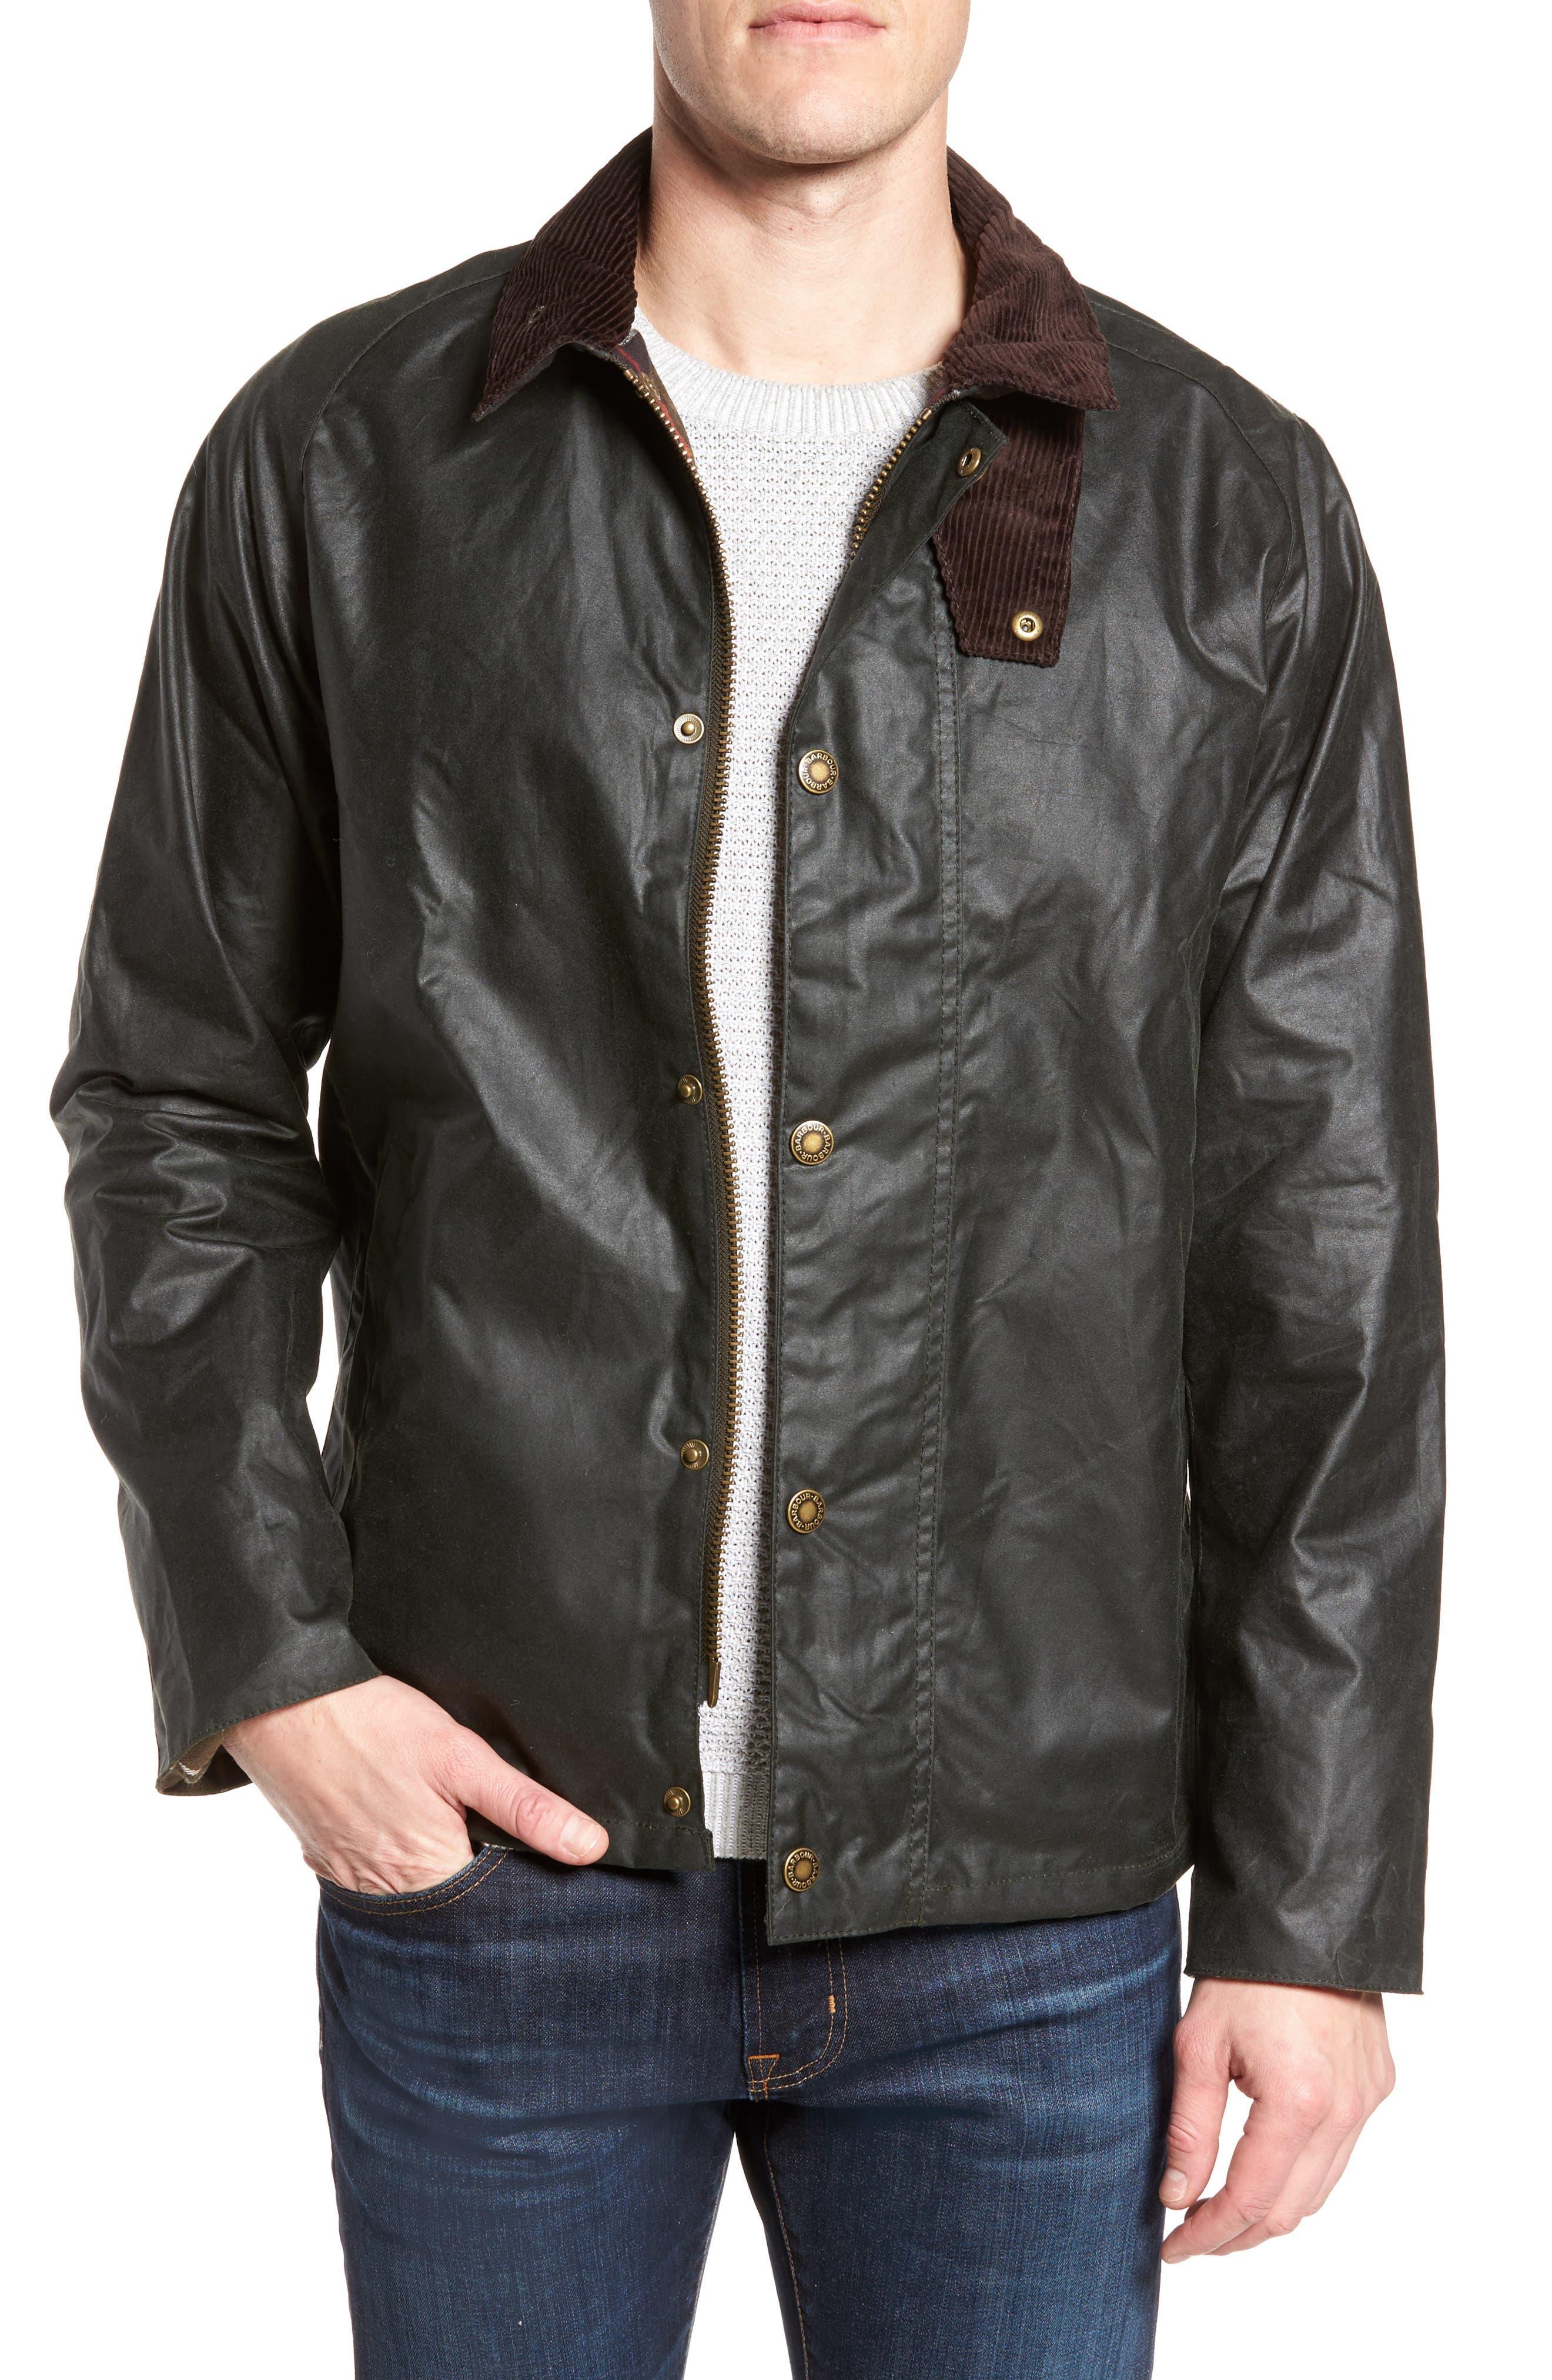 Heskin Waxed Cotton Jacket,                         Main,                         color, SAGE